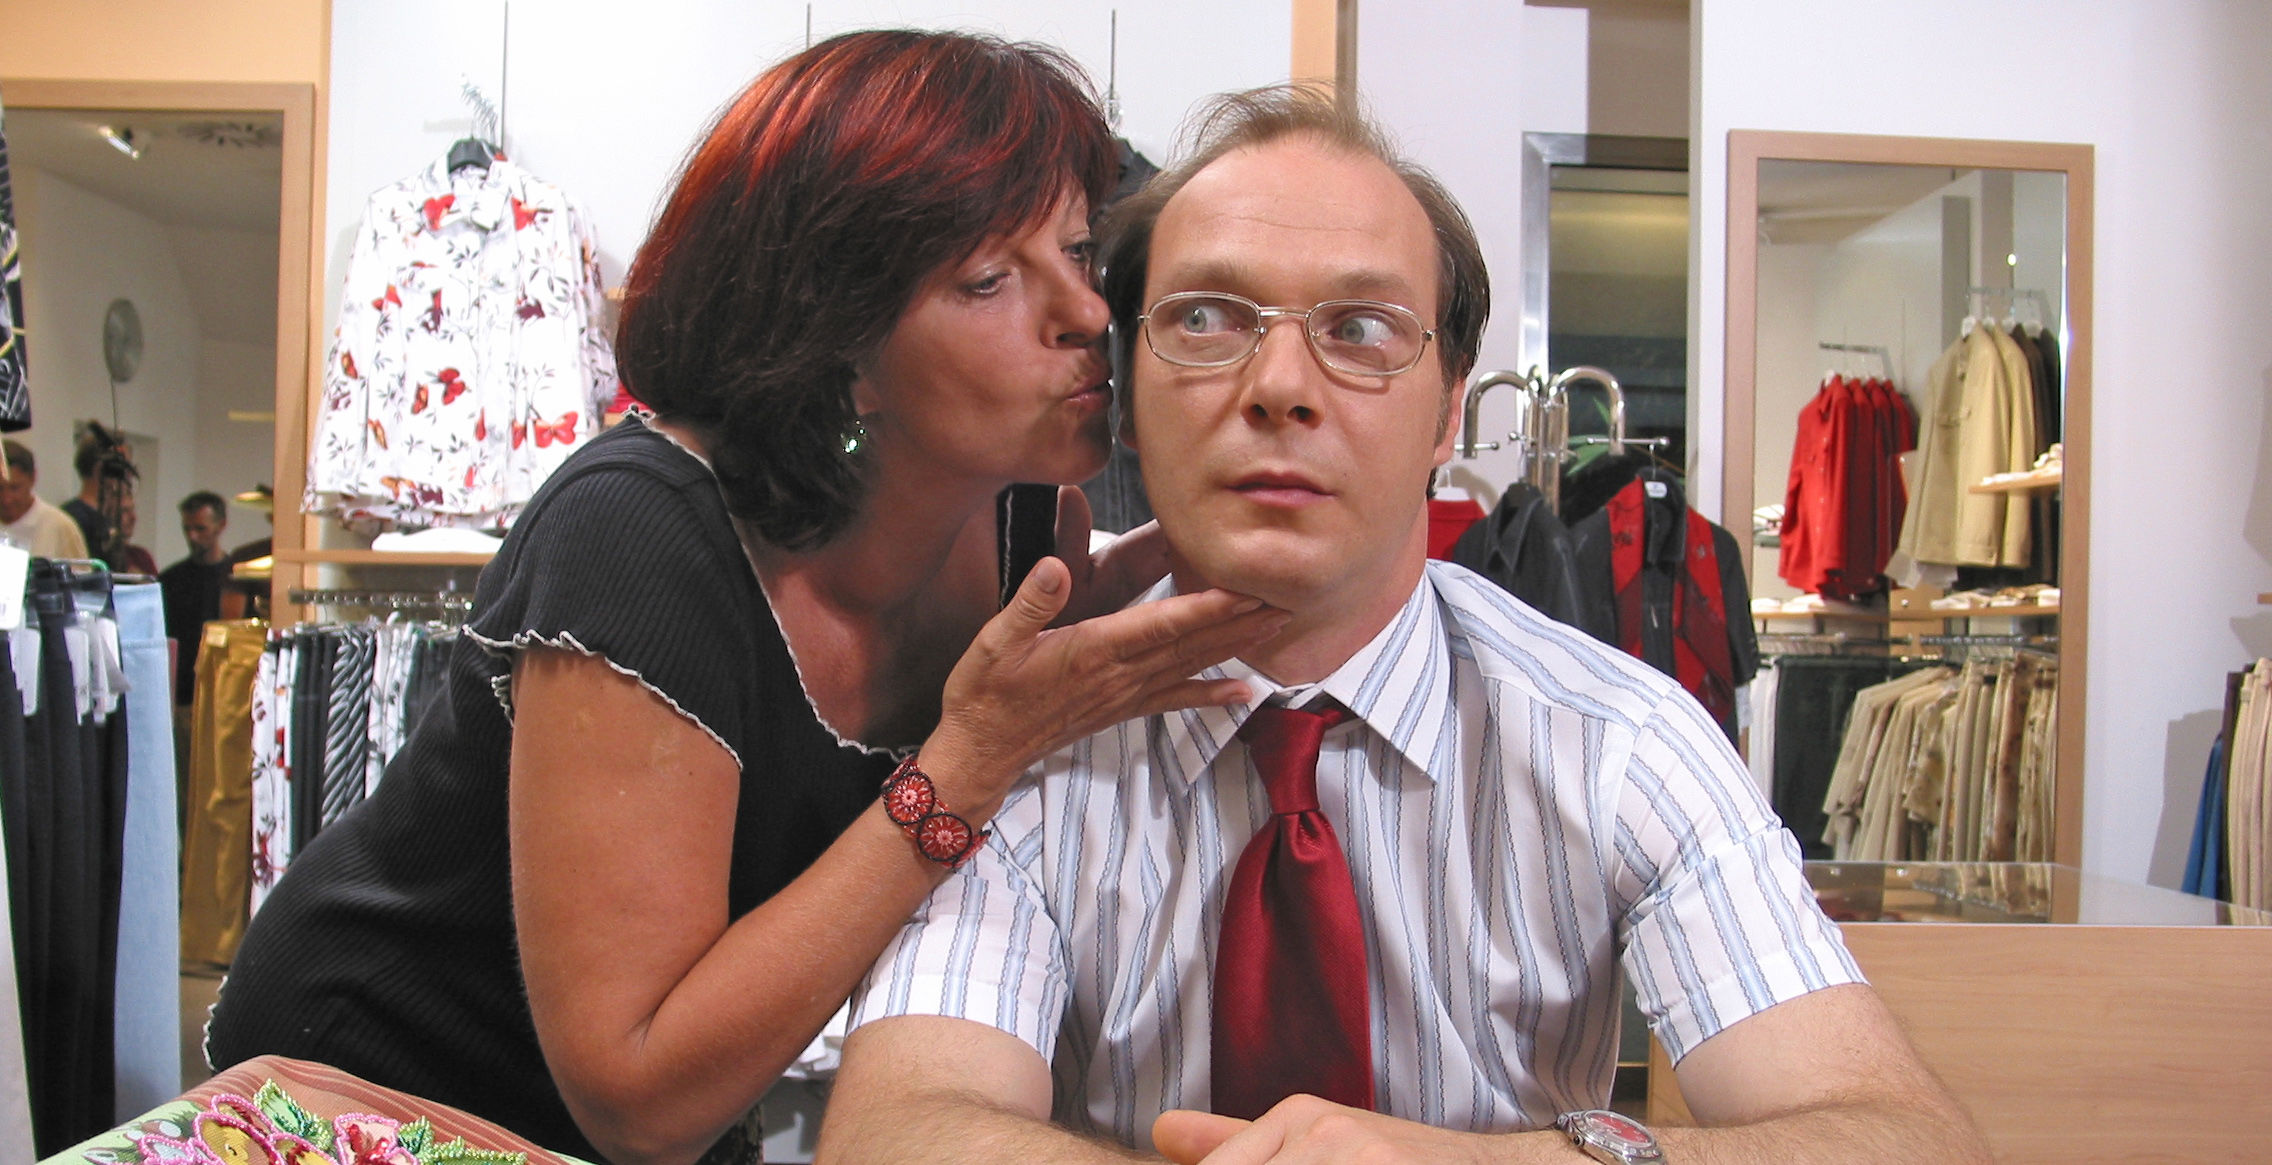 Conny (Elfi Eschke), Schneider (Martin Brambach)